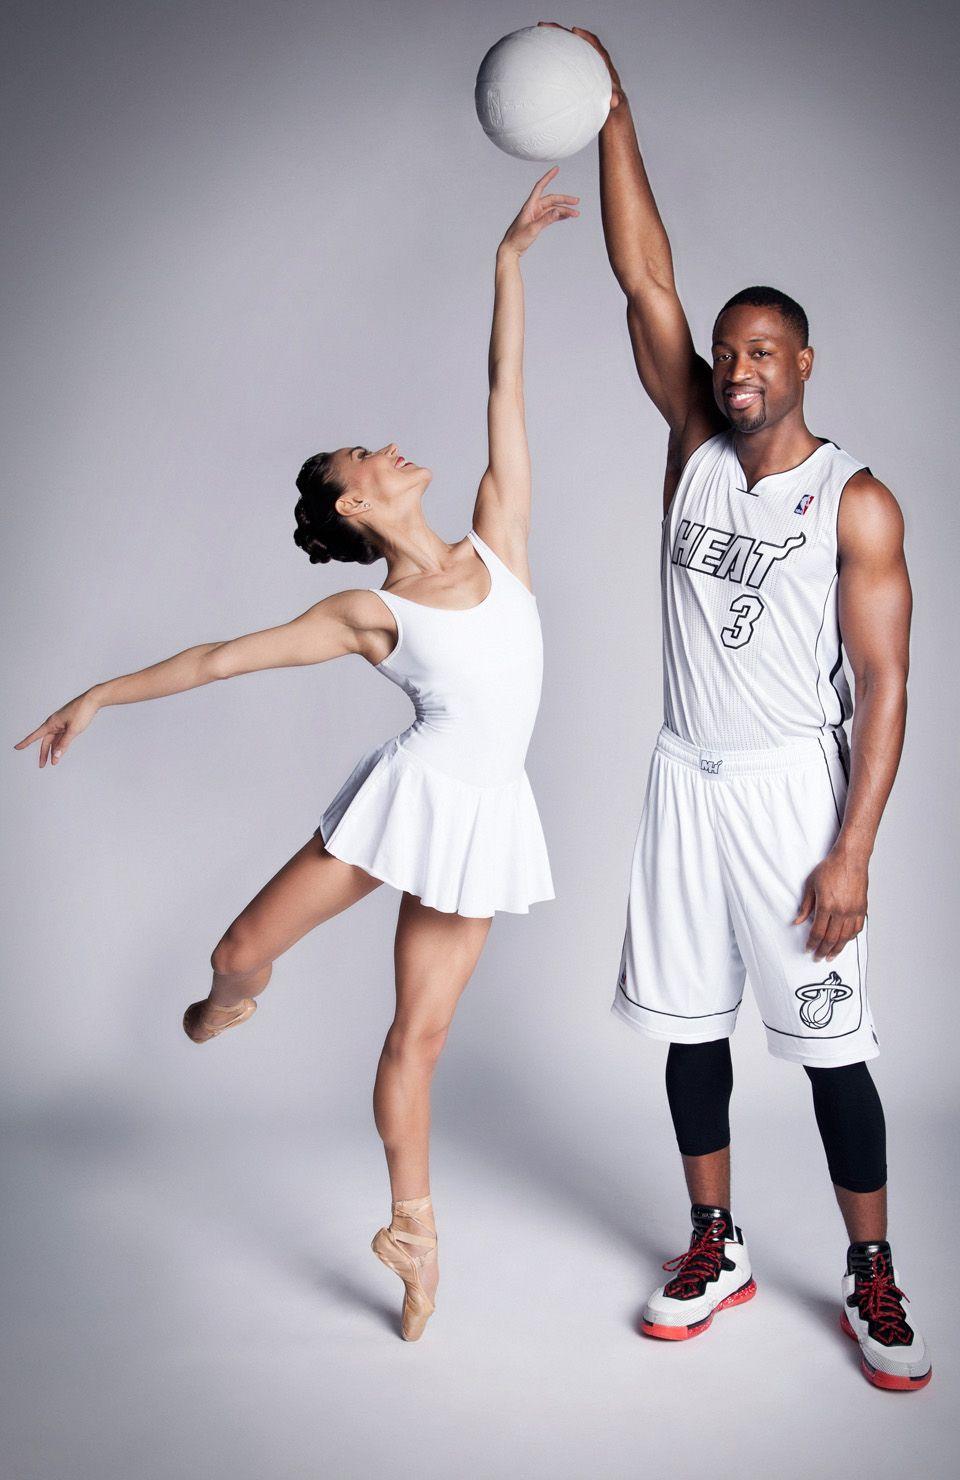 Mi miami heat highest paid player by year - Miami City Ballet S Patricia Delgado And Miami Heat S Dwyane Wade